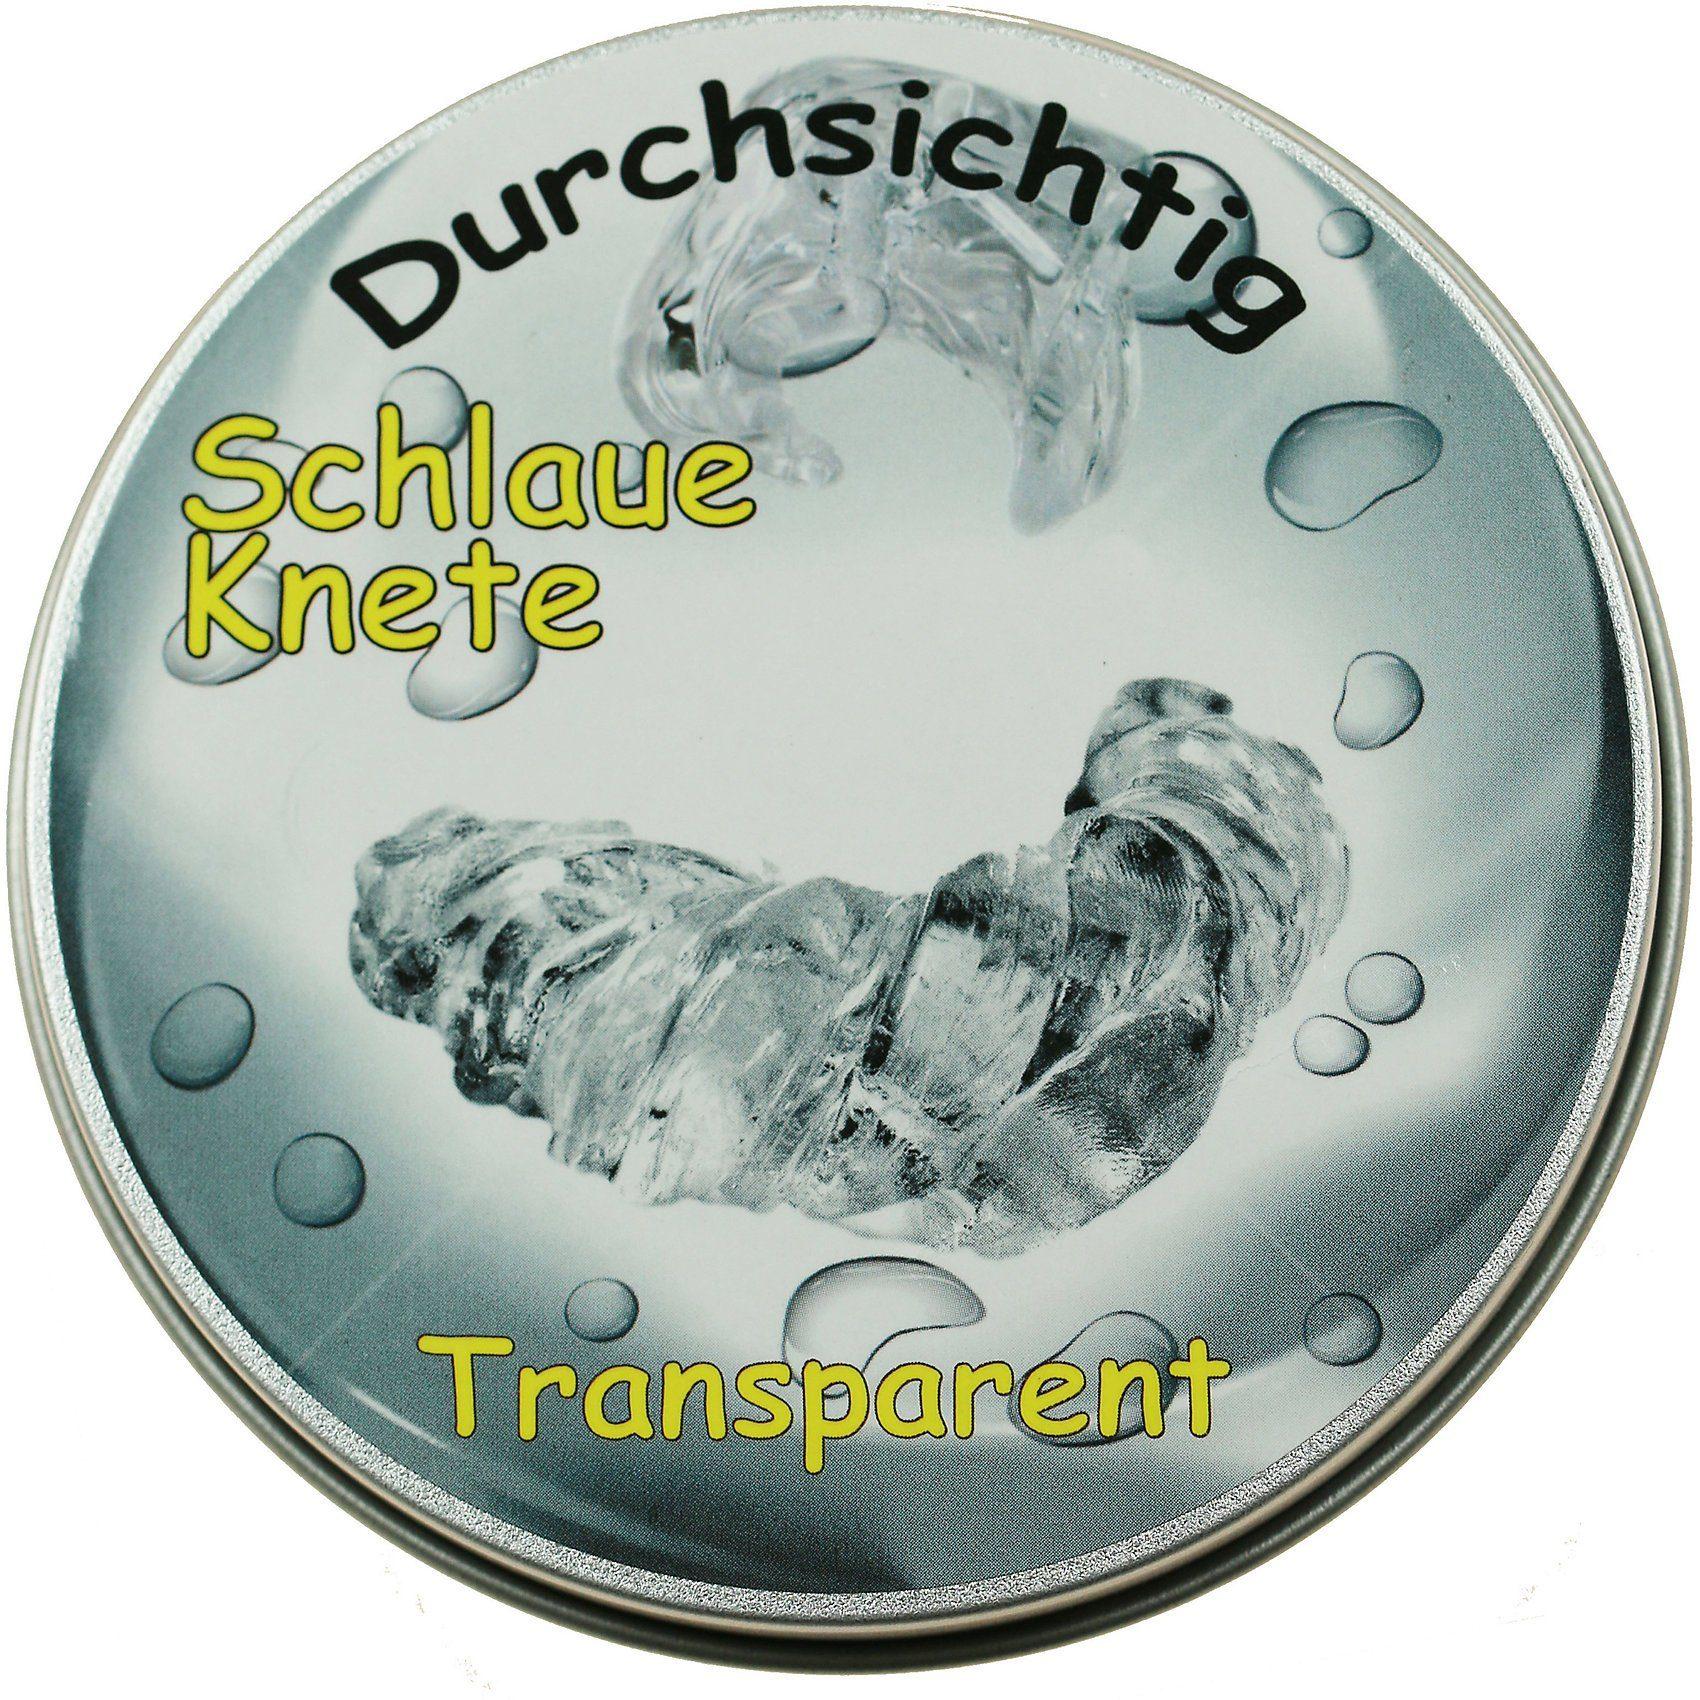 Schlaue Knete transparent, 50 g Metalldose